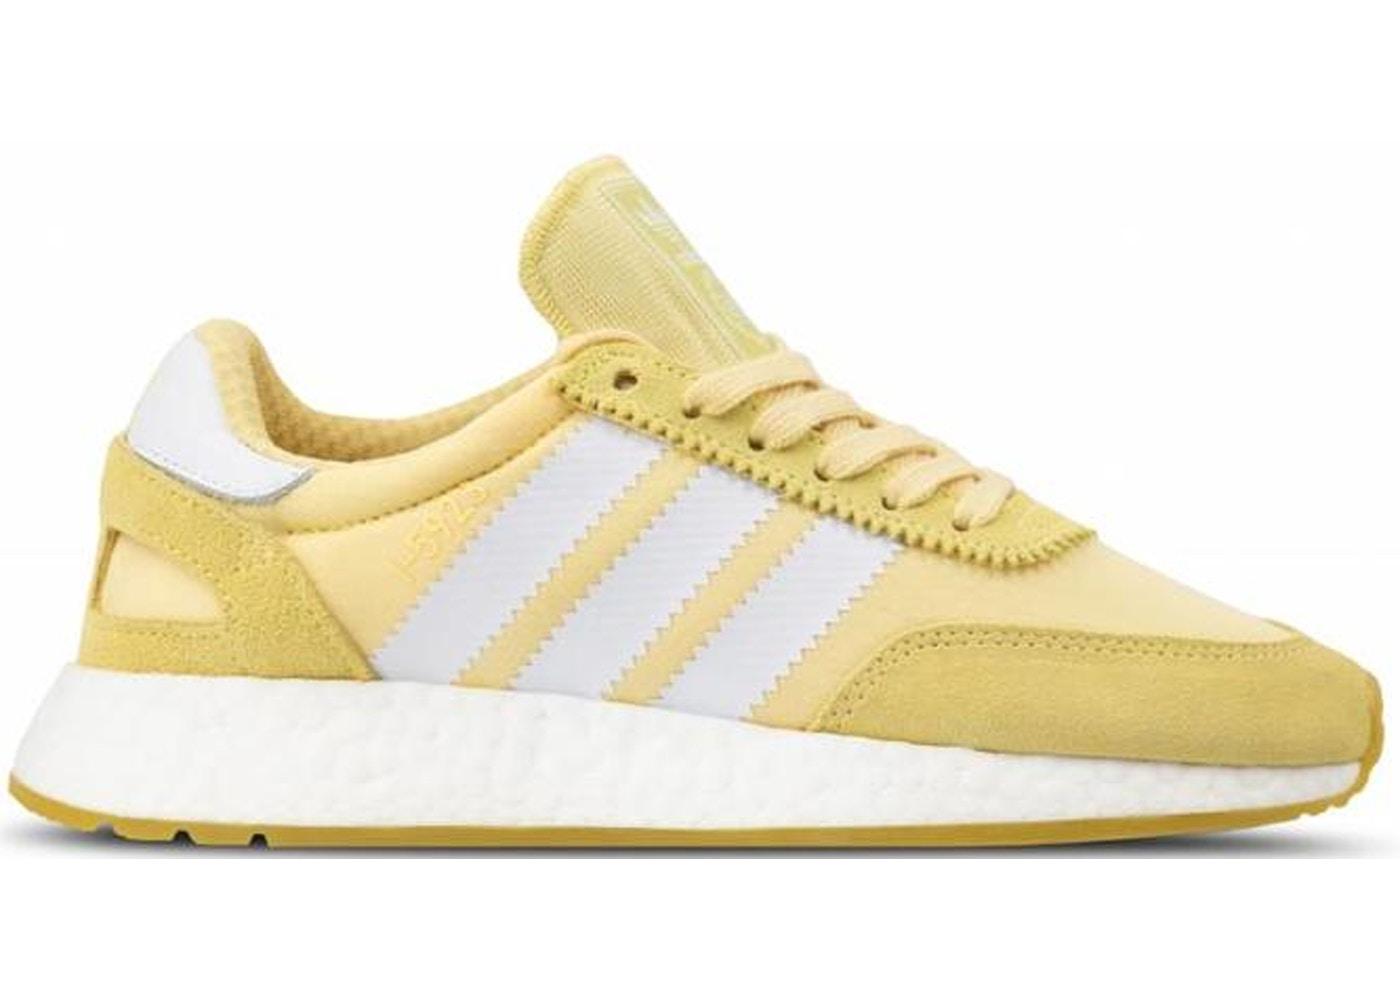 Iniki Size Deadstock Shoesamp; 6 Sneakers Adidas Buy OPuTikXZ